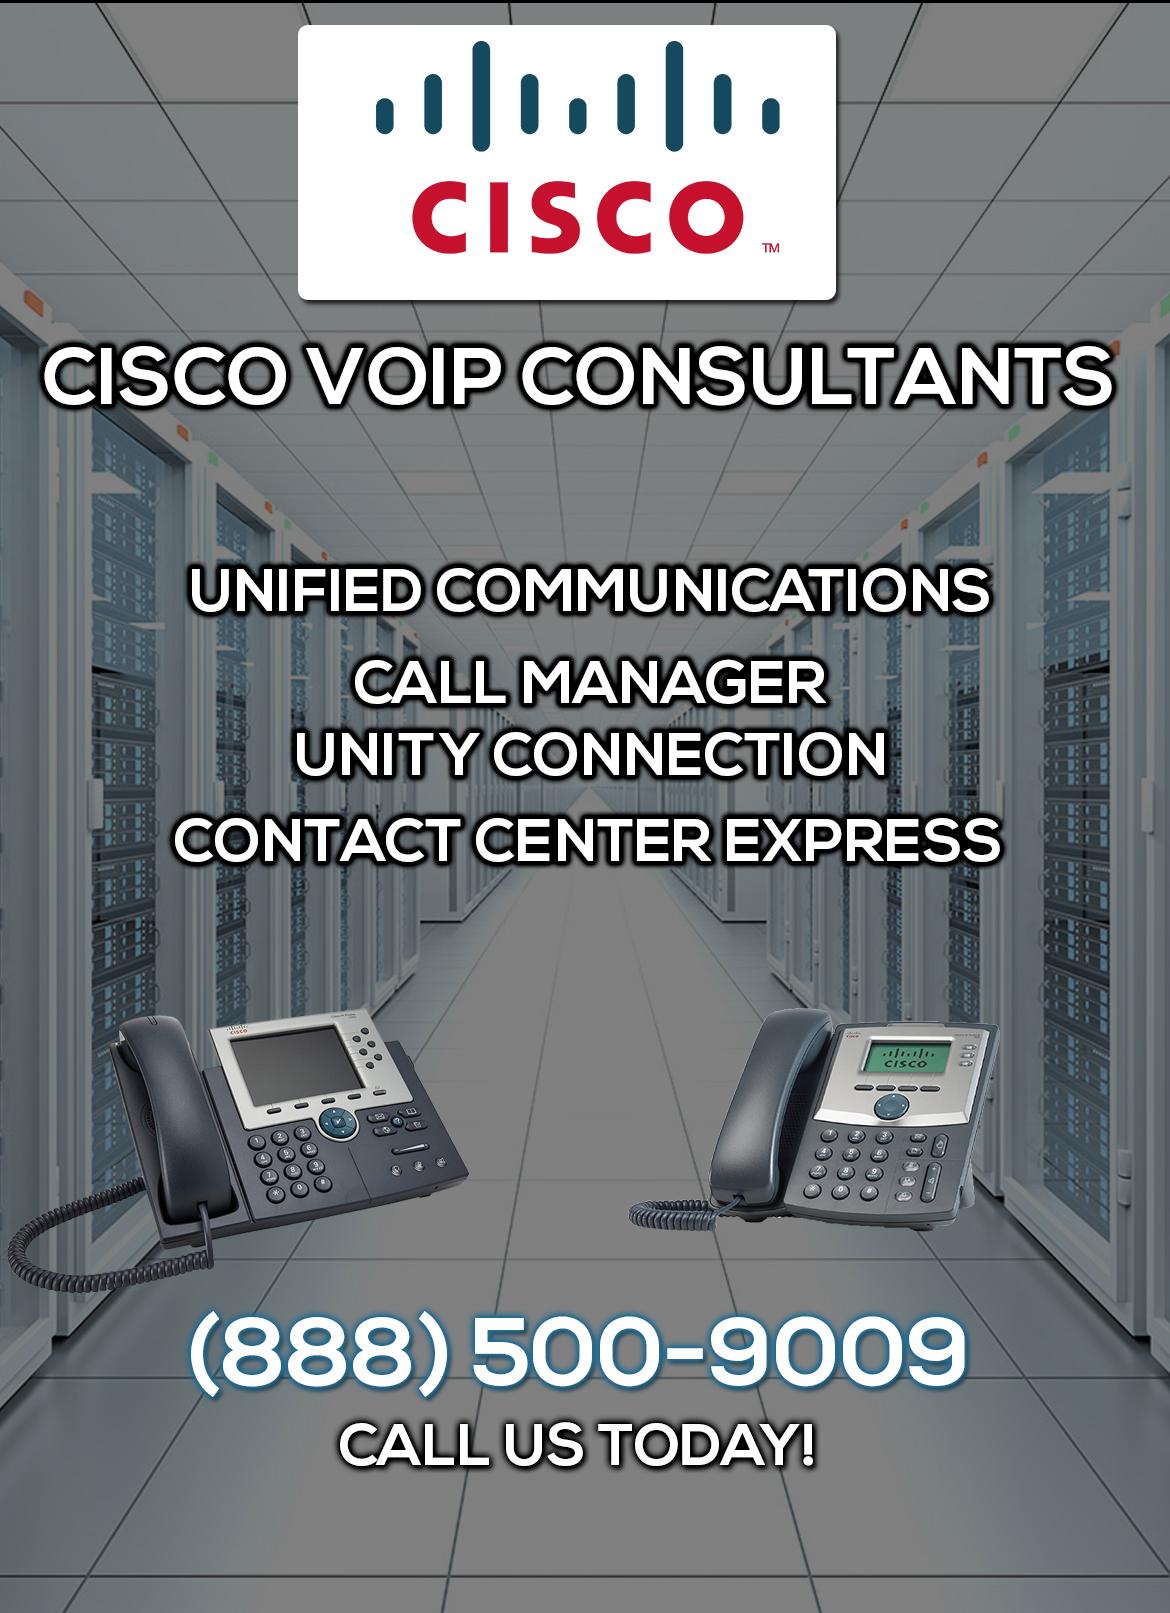 Cisco VoIP Consultants Cypress